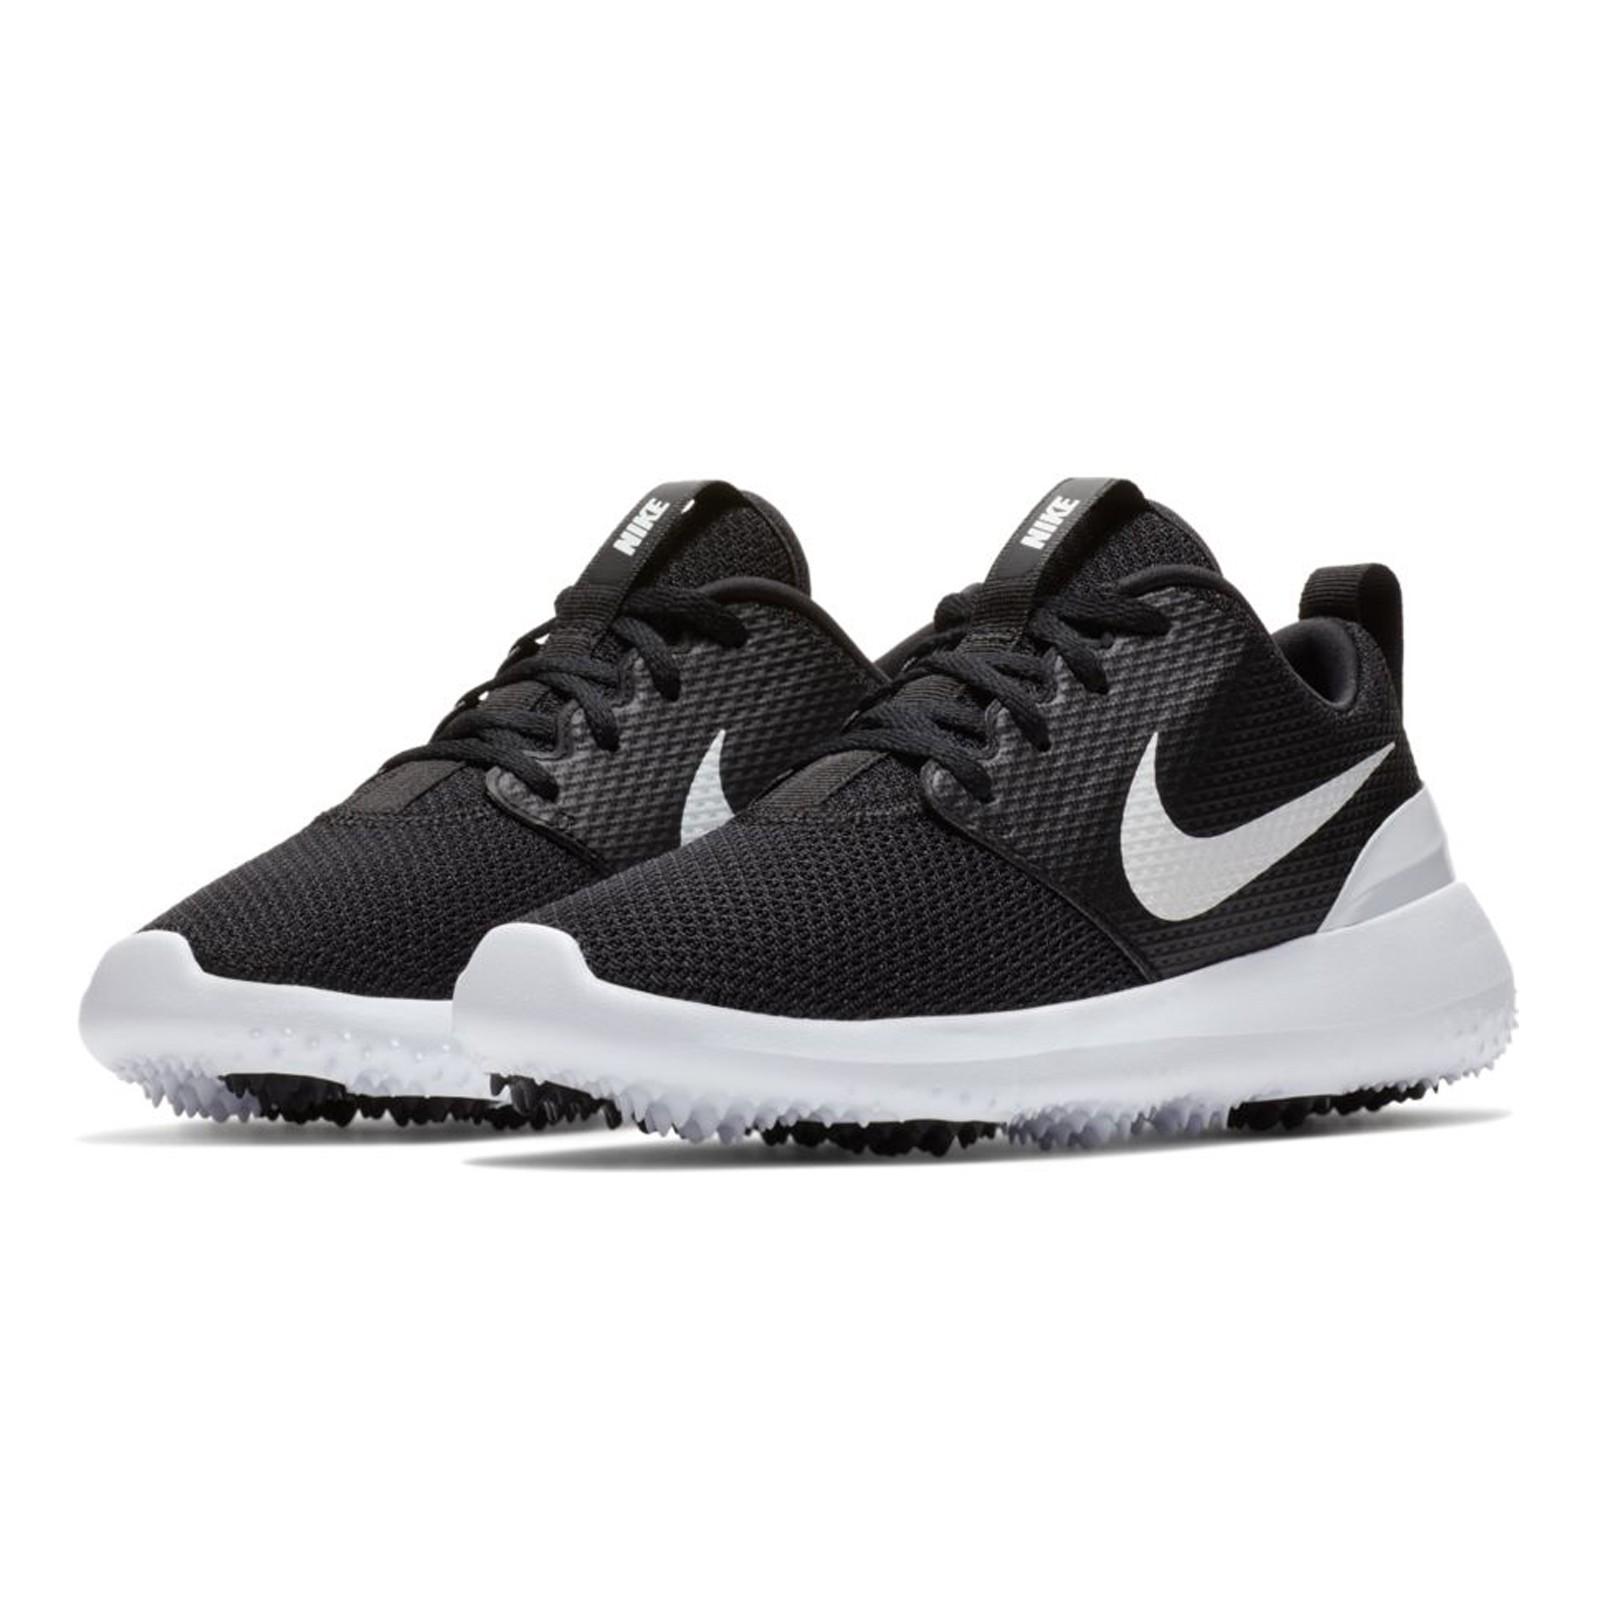 cc3df9c251ee Nike Roshe G Junior Golf Shoes